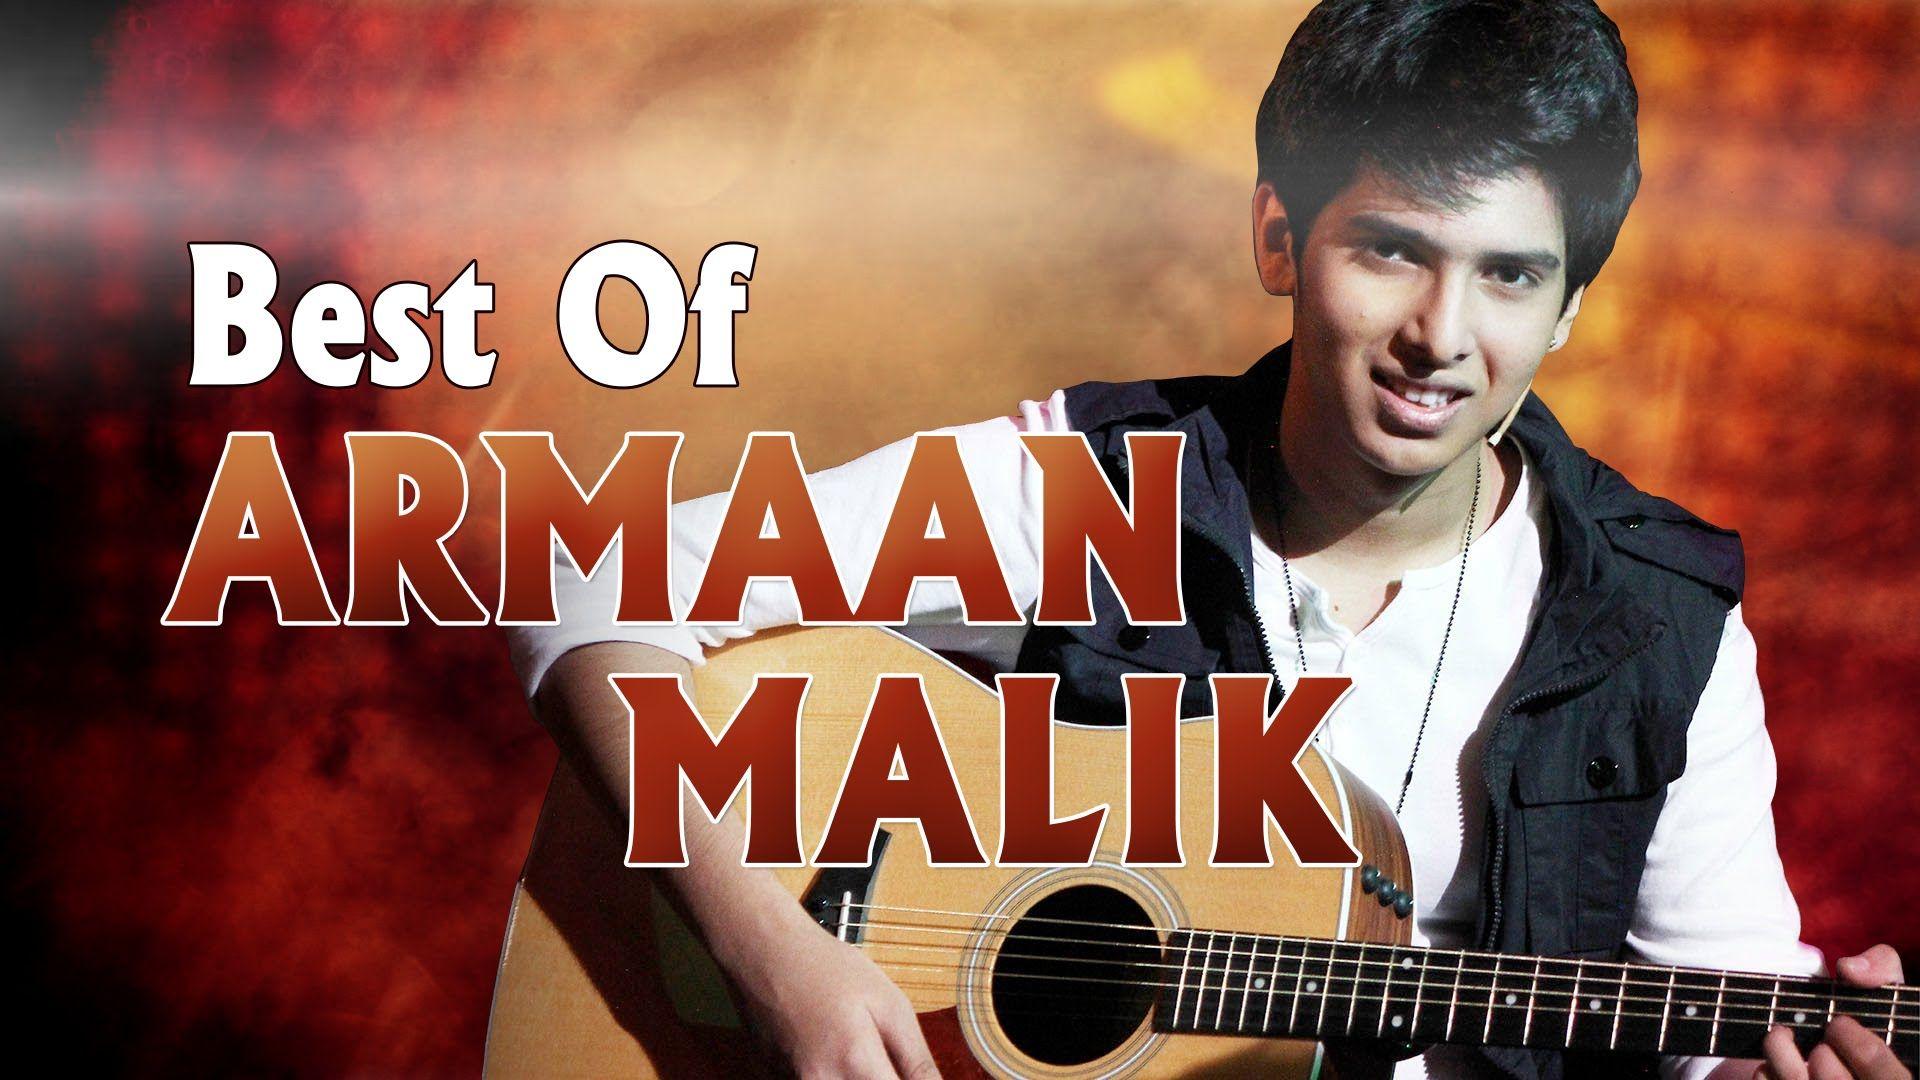 Best of ARMAAN MALIK SONGS (Latest Jukebox ) TSeries